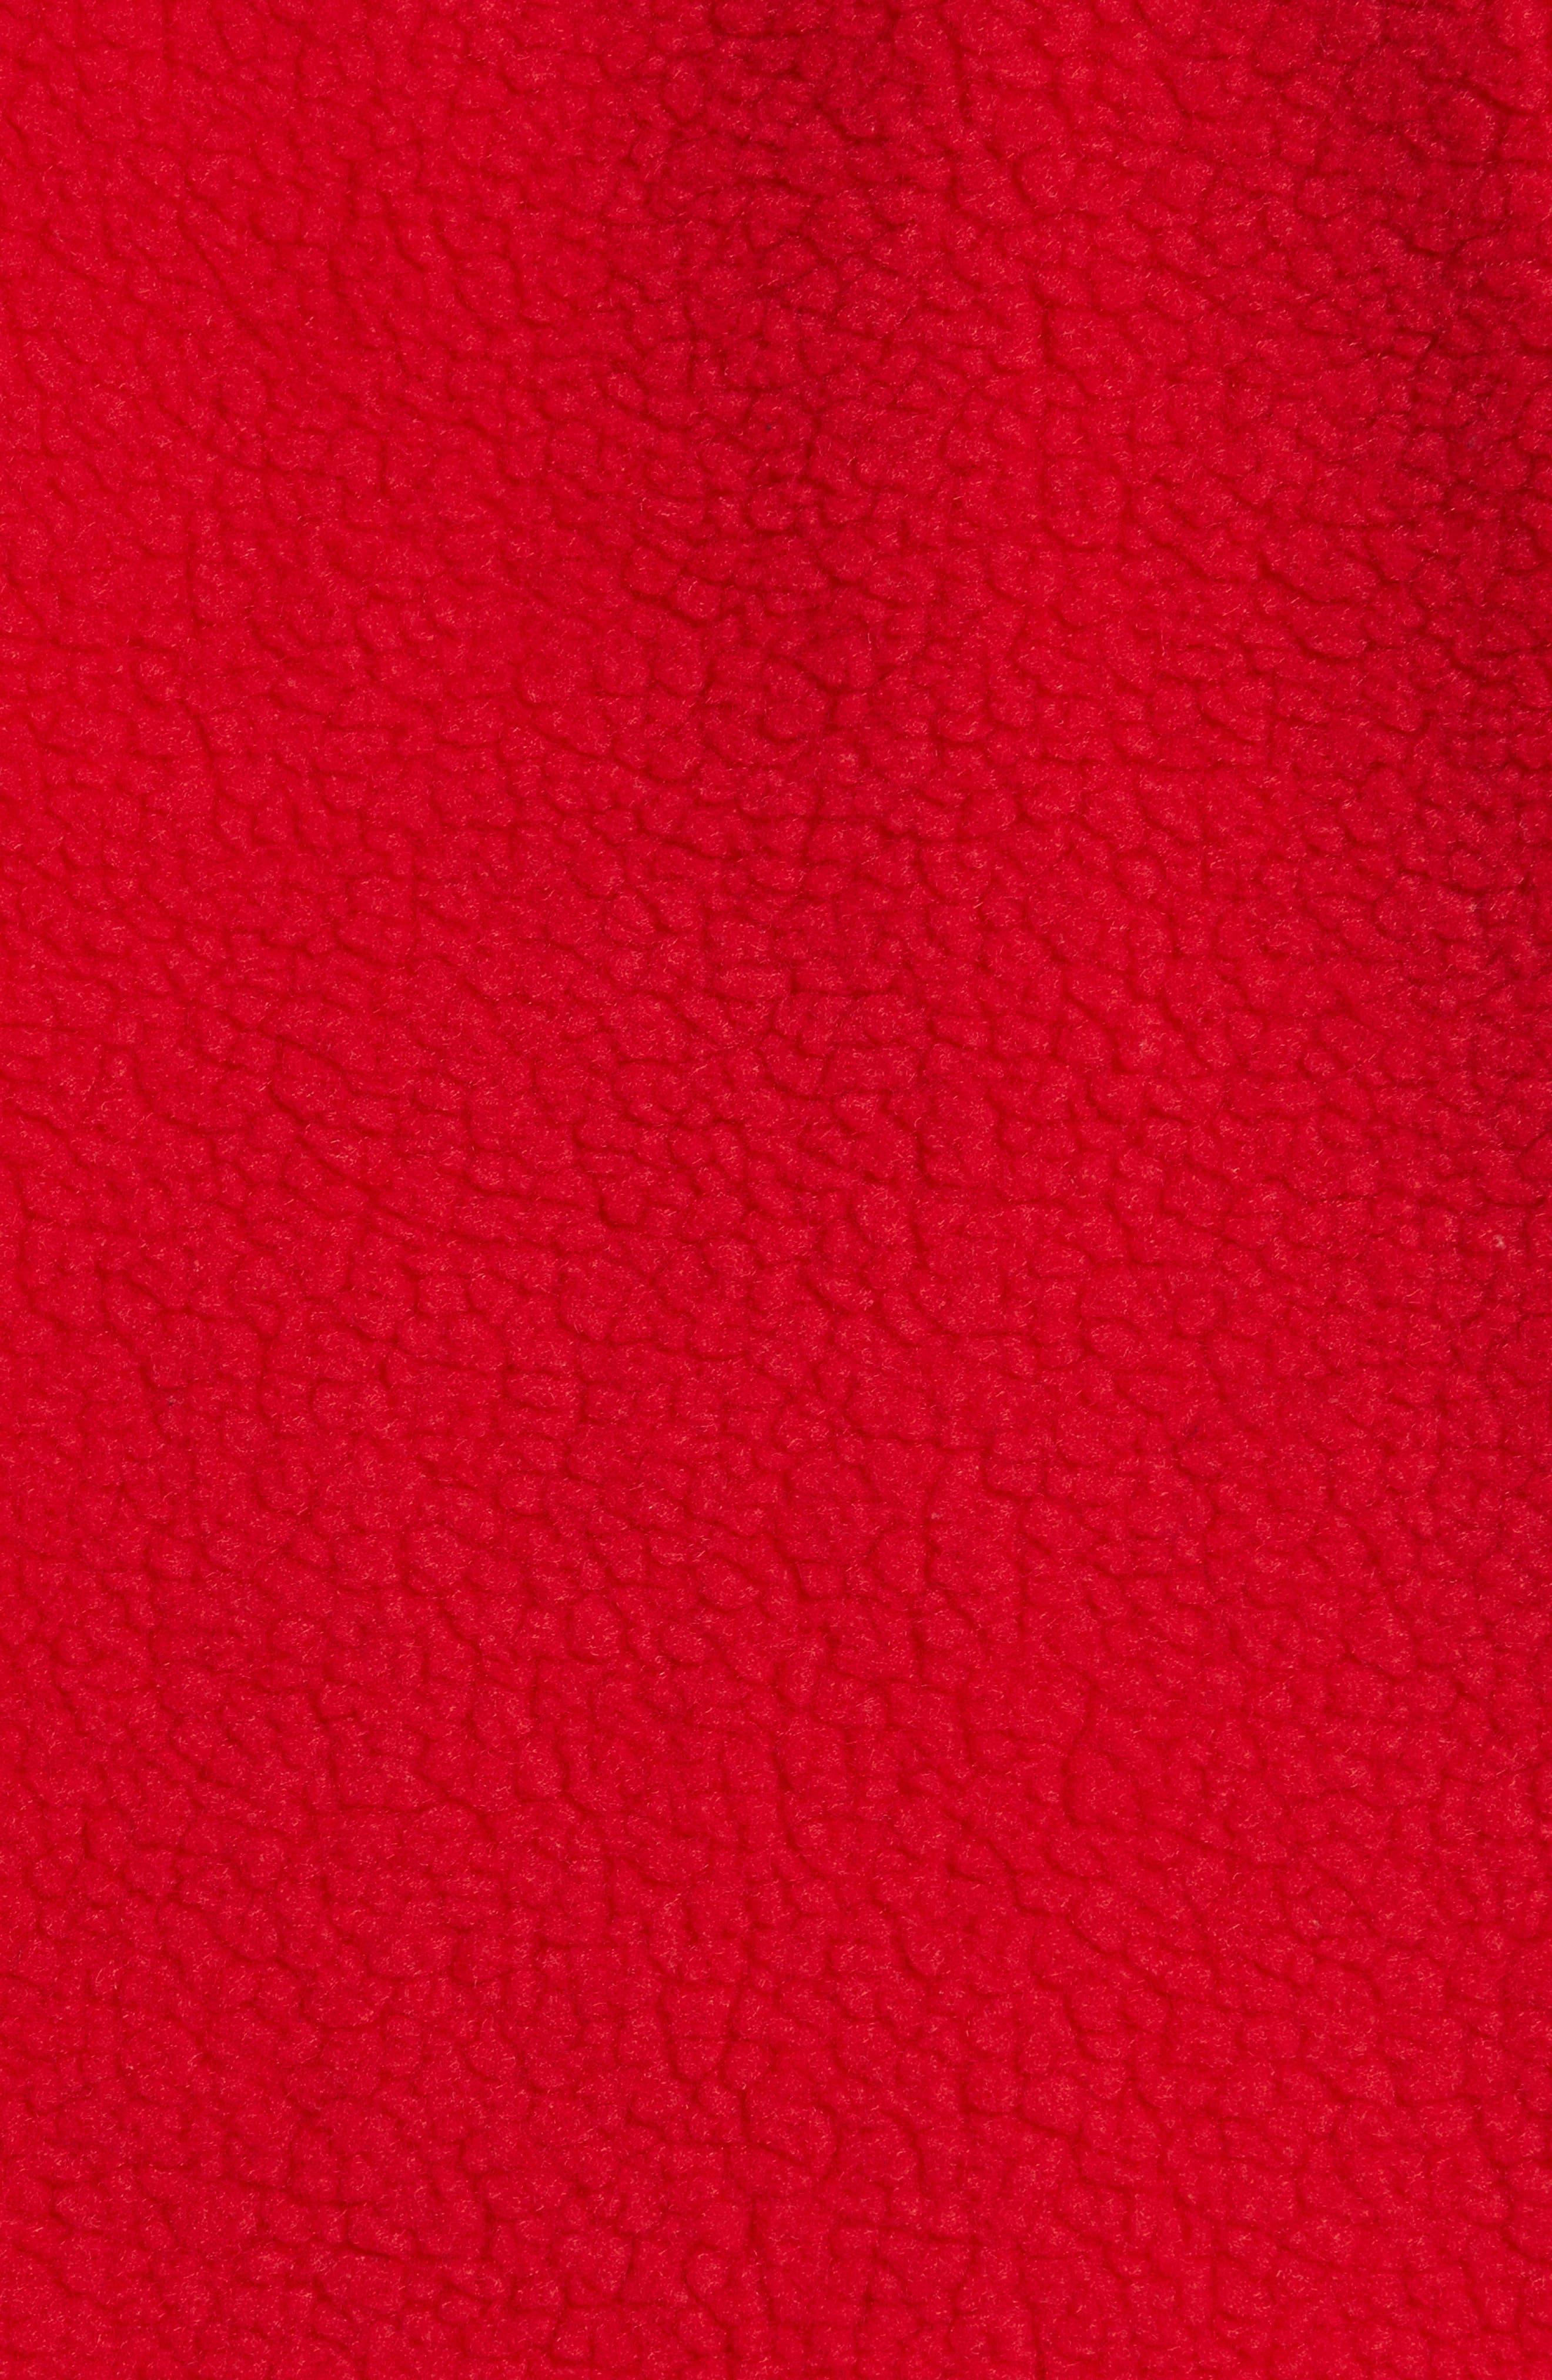 Denali Jacket,                             Alternate thumbnail 11, color,                             Tnf Red